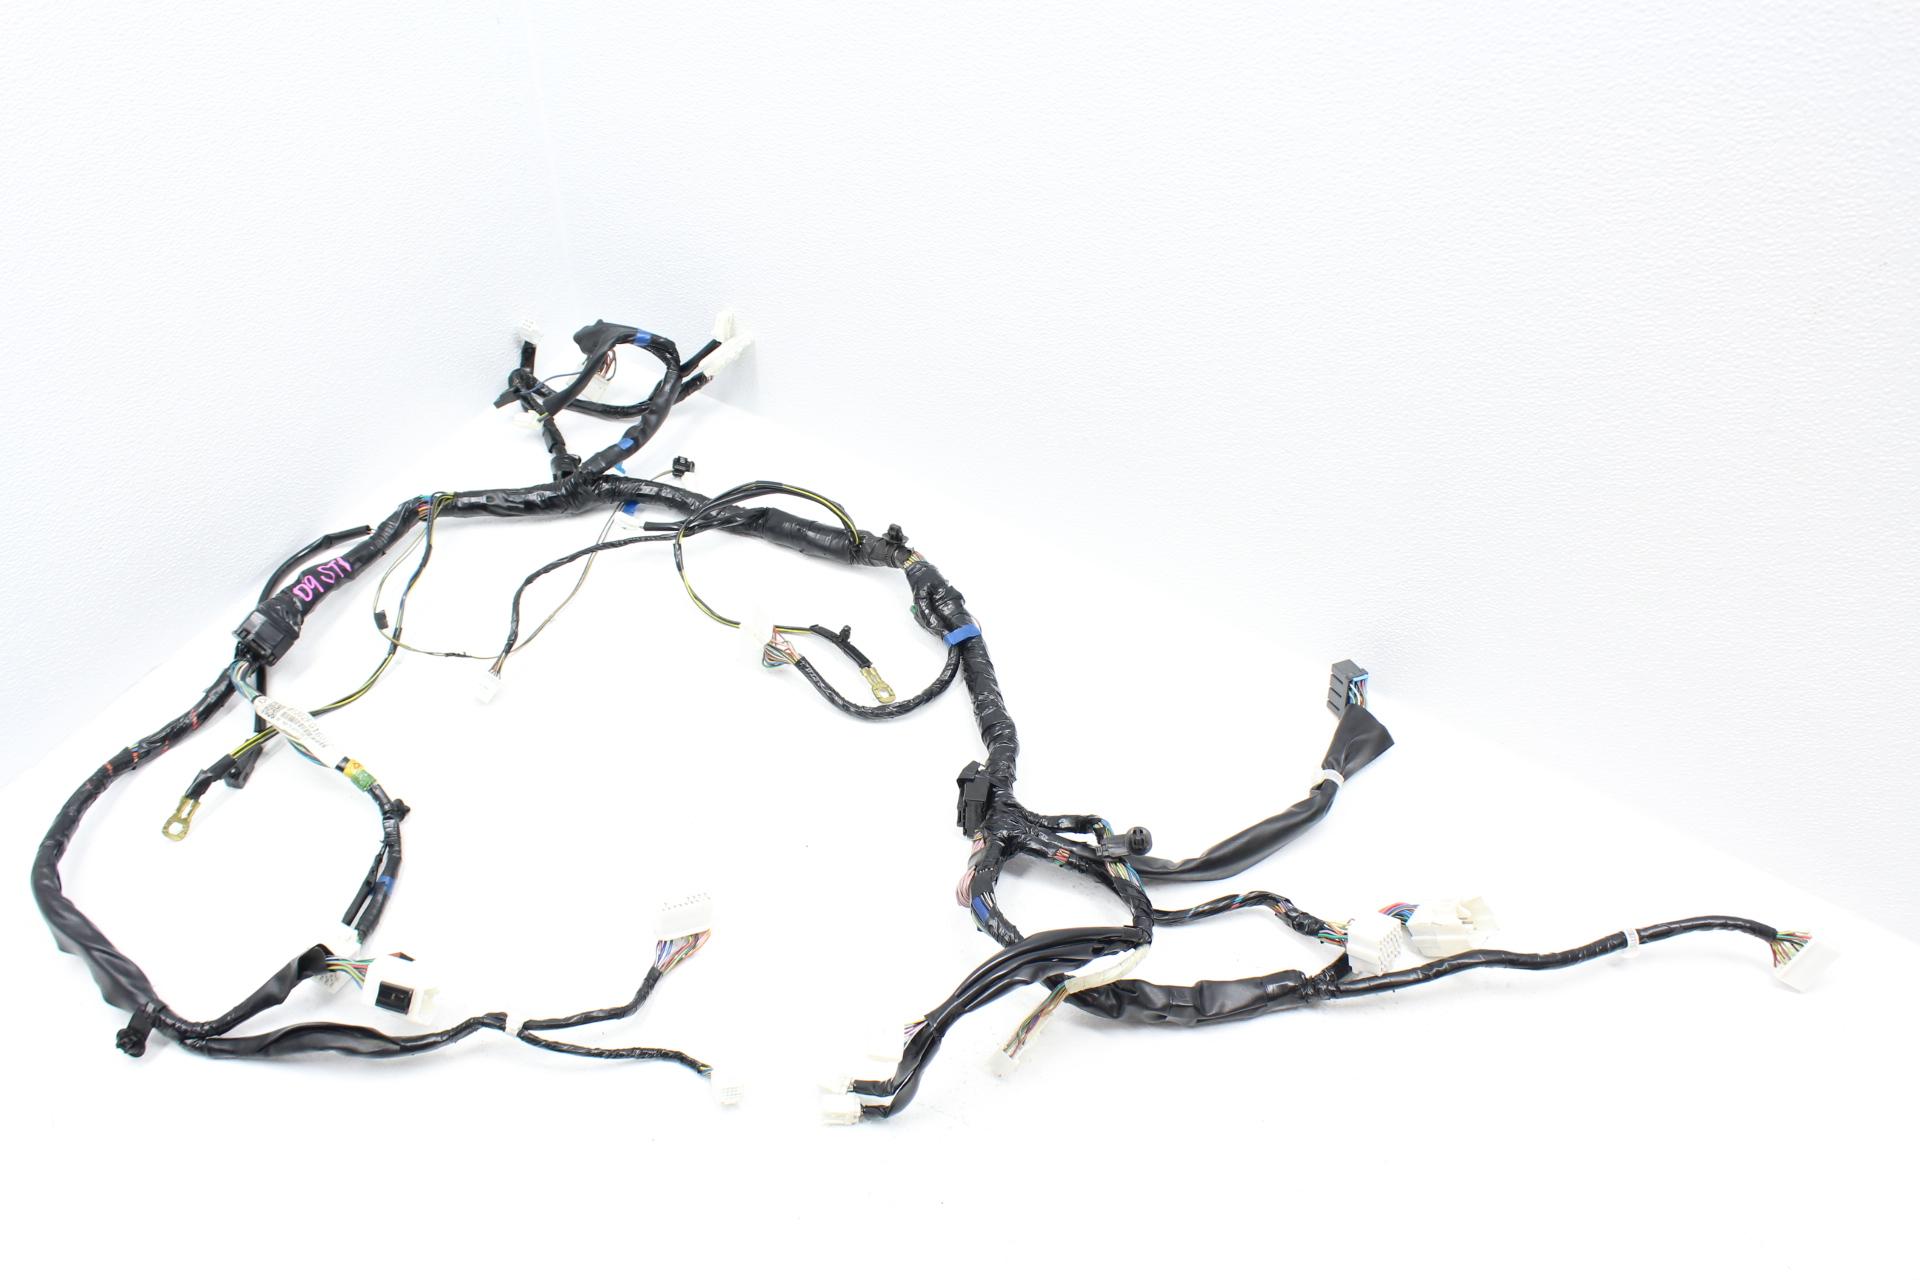 09 Subaru Wrx Sti Instrument Cluster Wire Wiring